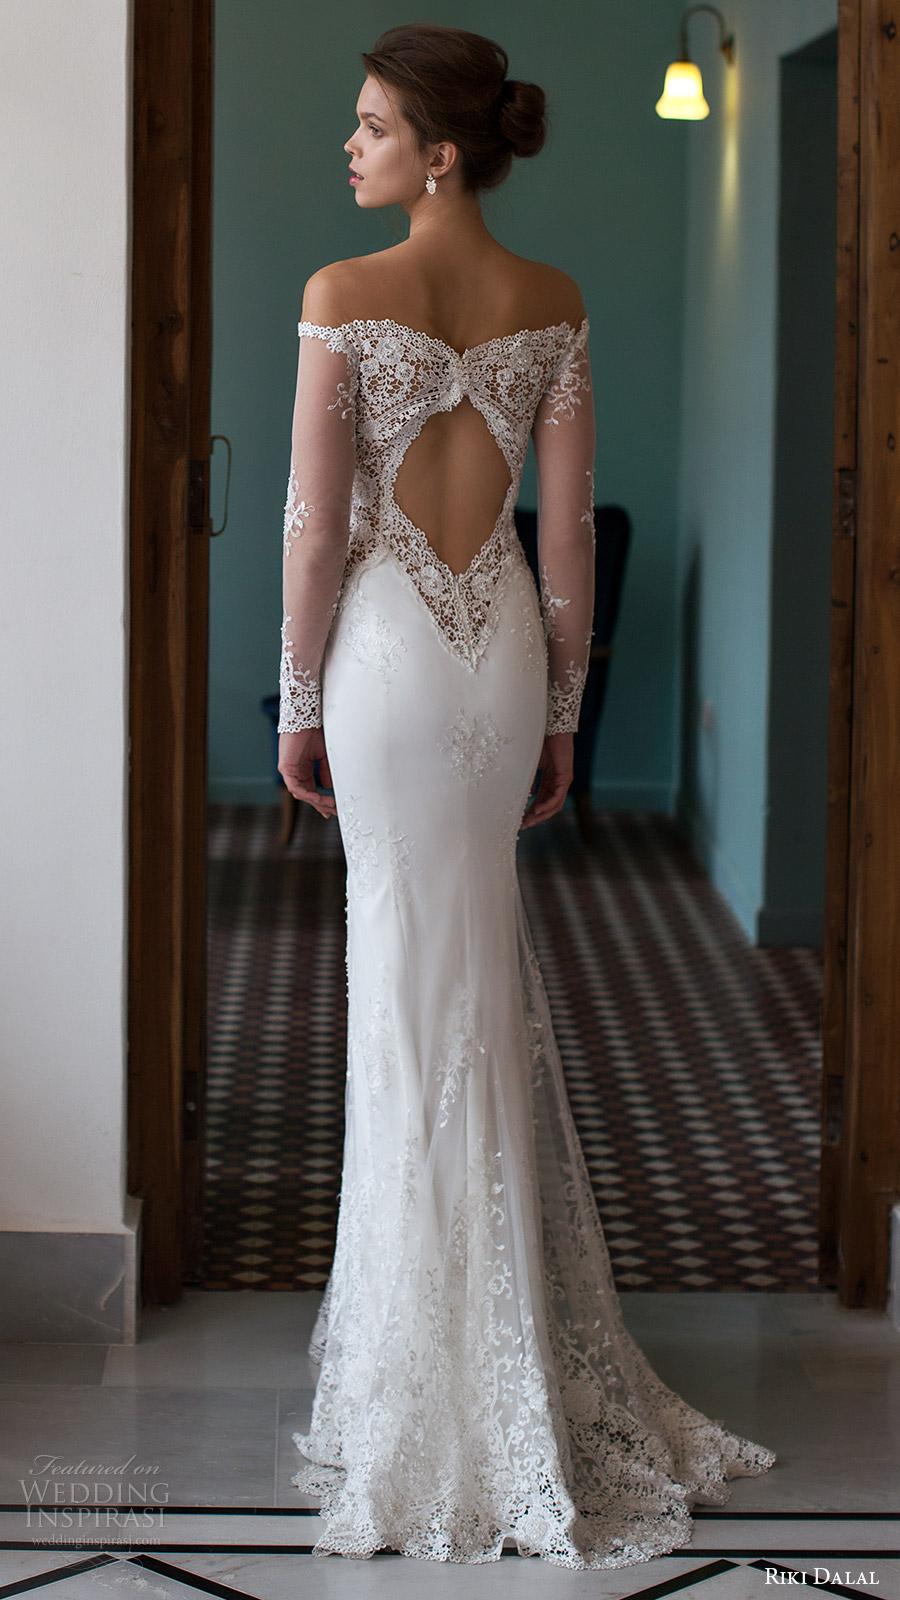 Riki Dalal 2016 Wedding Dresses  Verona Bridal Collection  Wedding Inspirasi